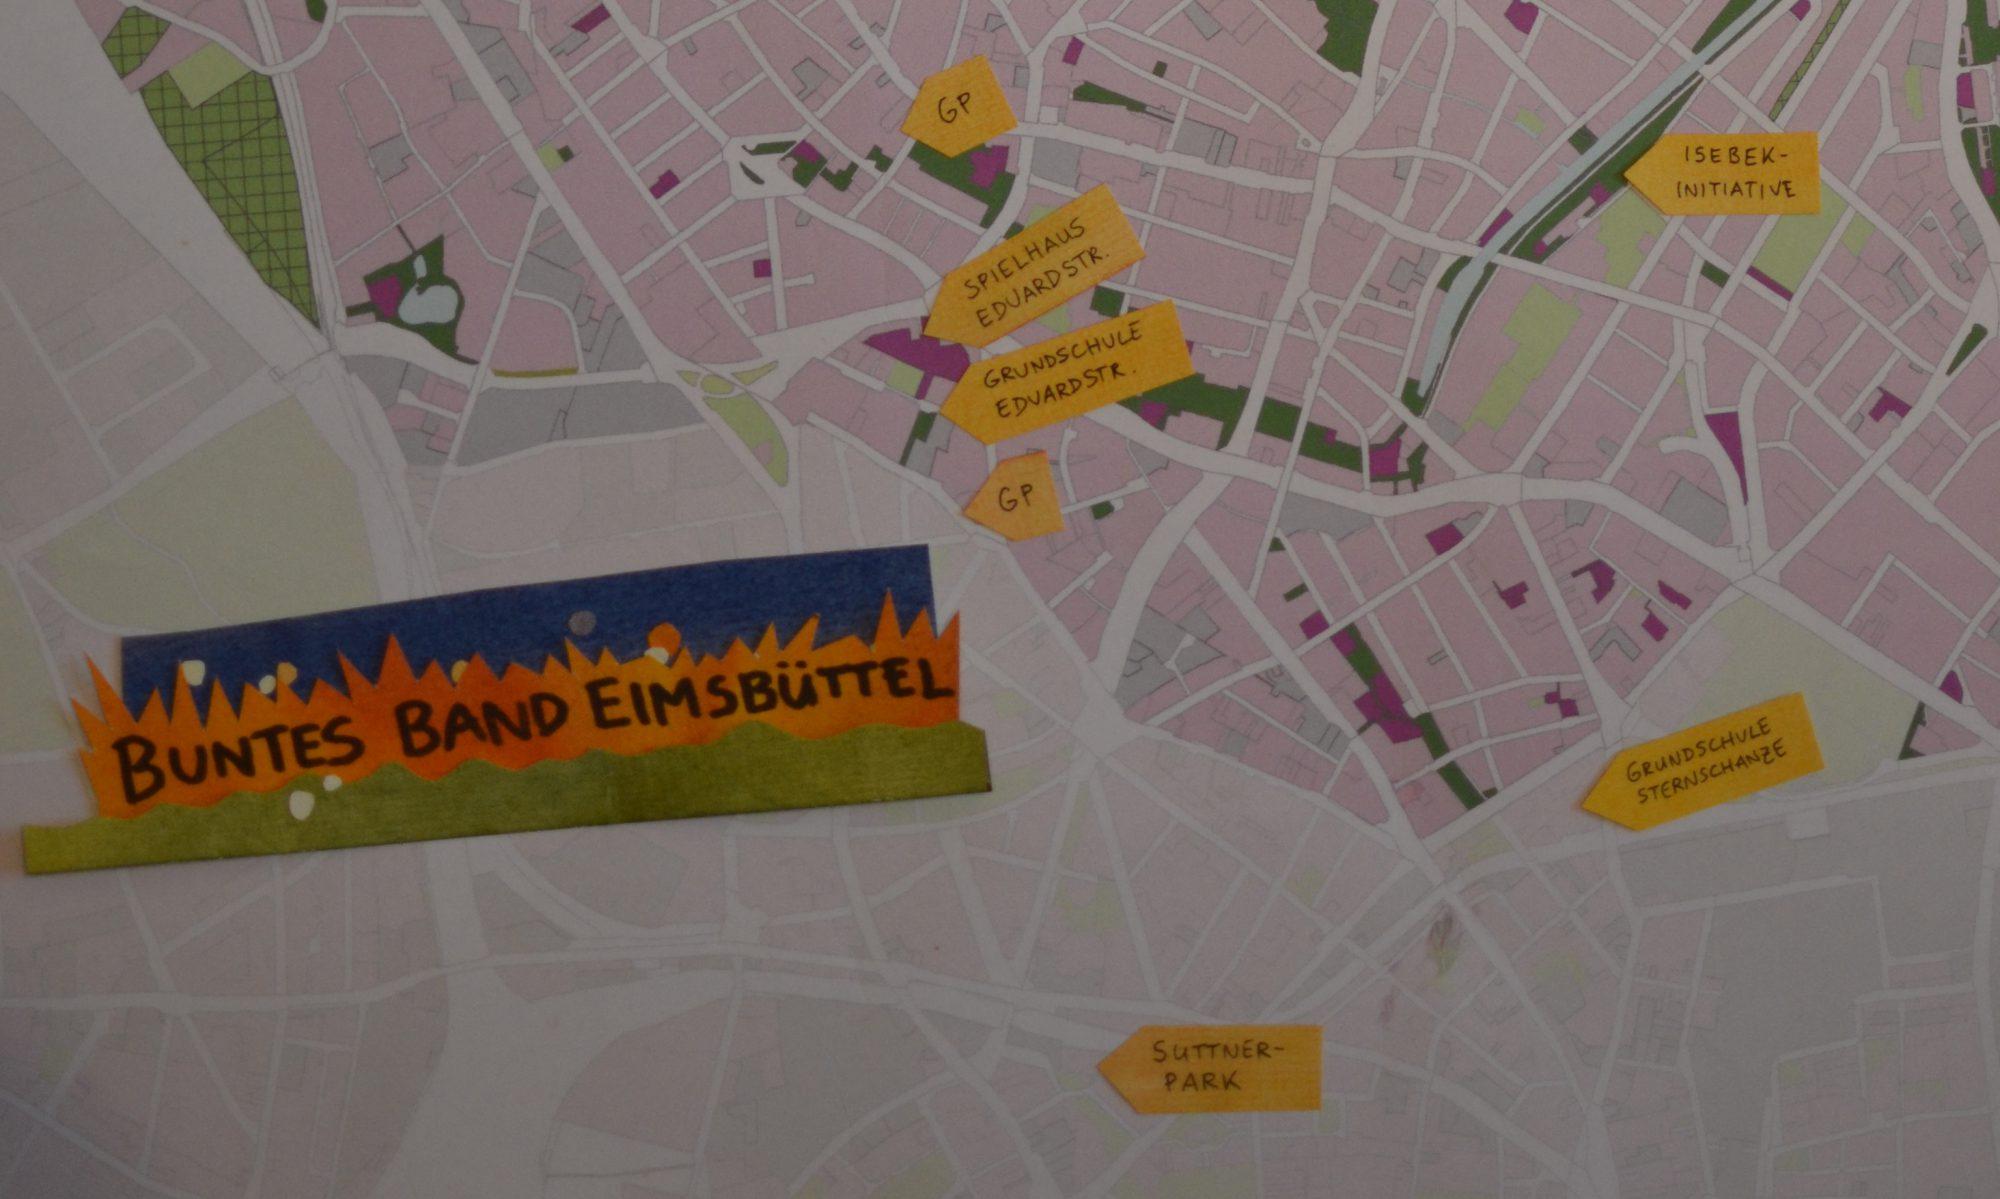 Buntes Band Eimsbüttel